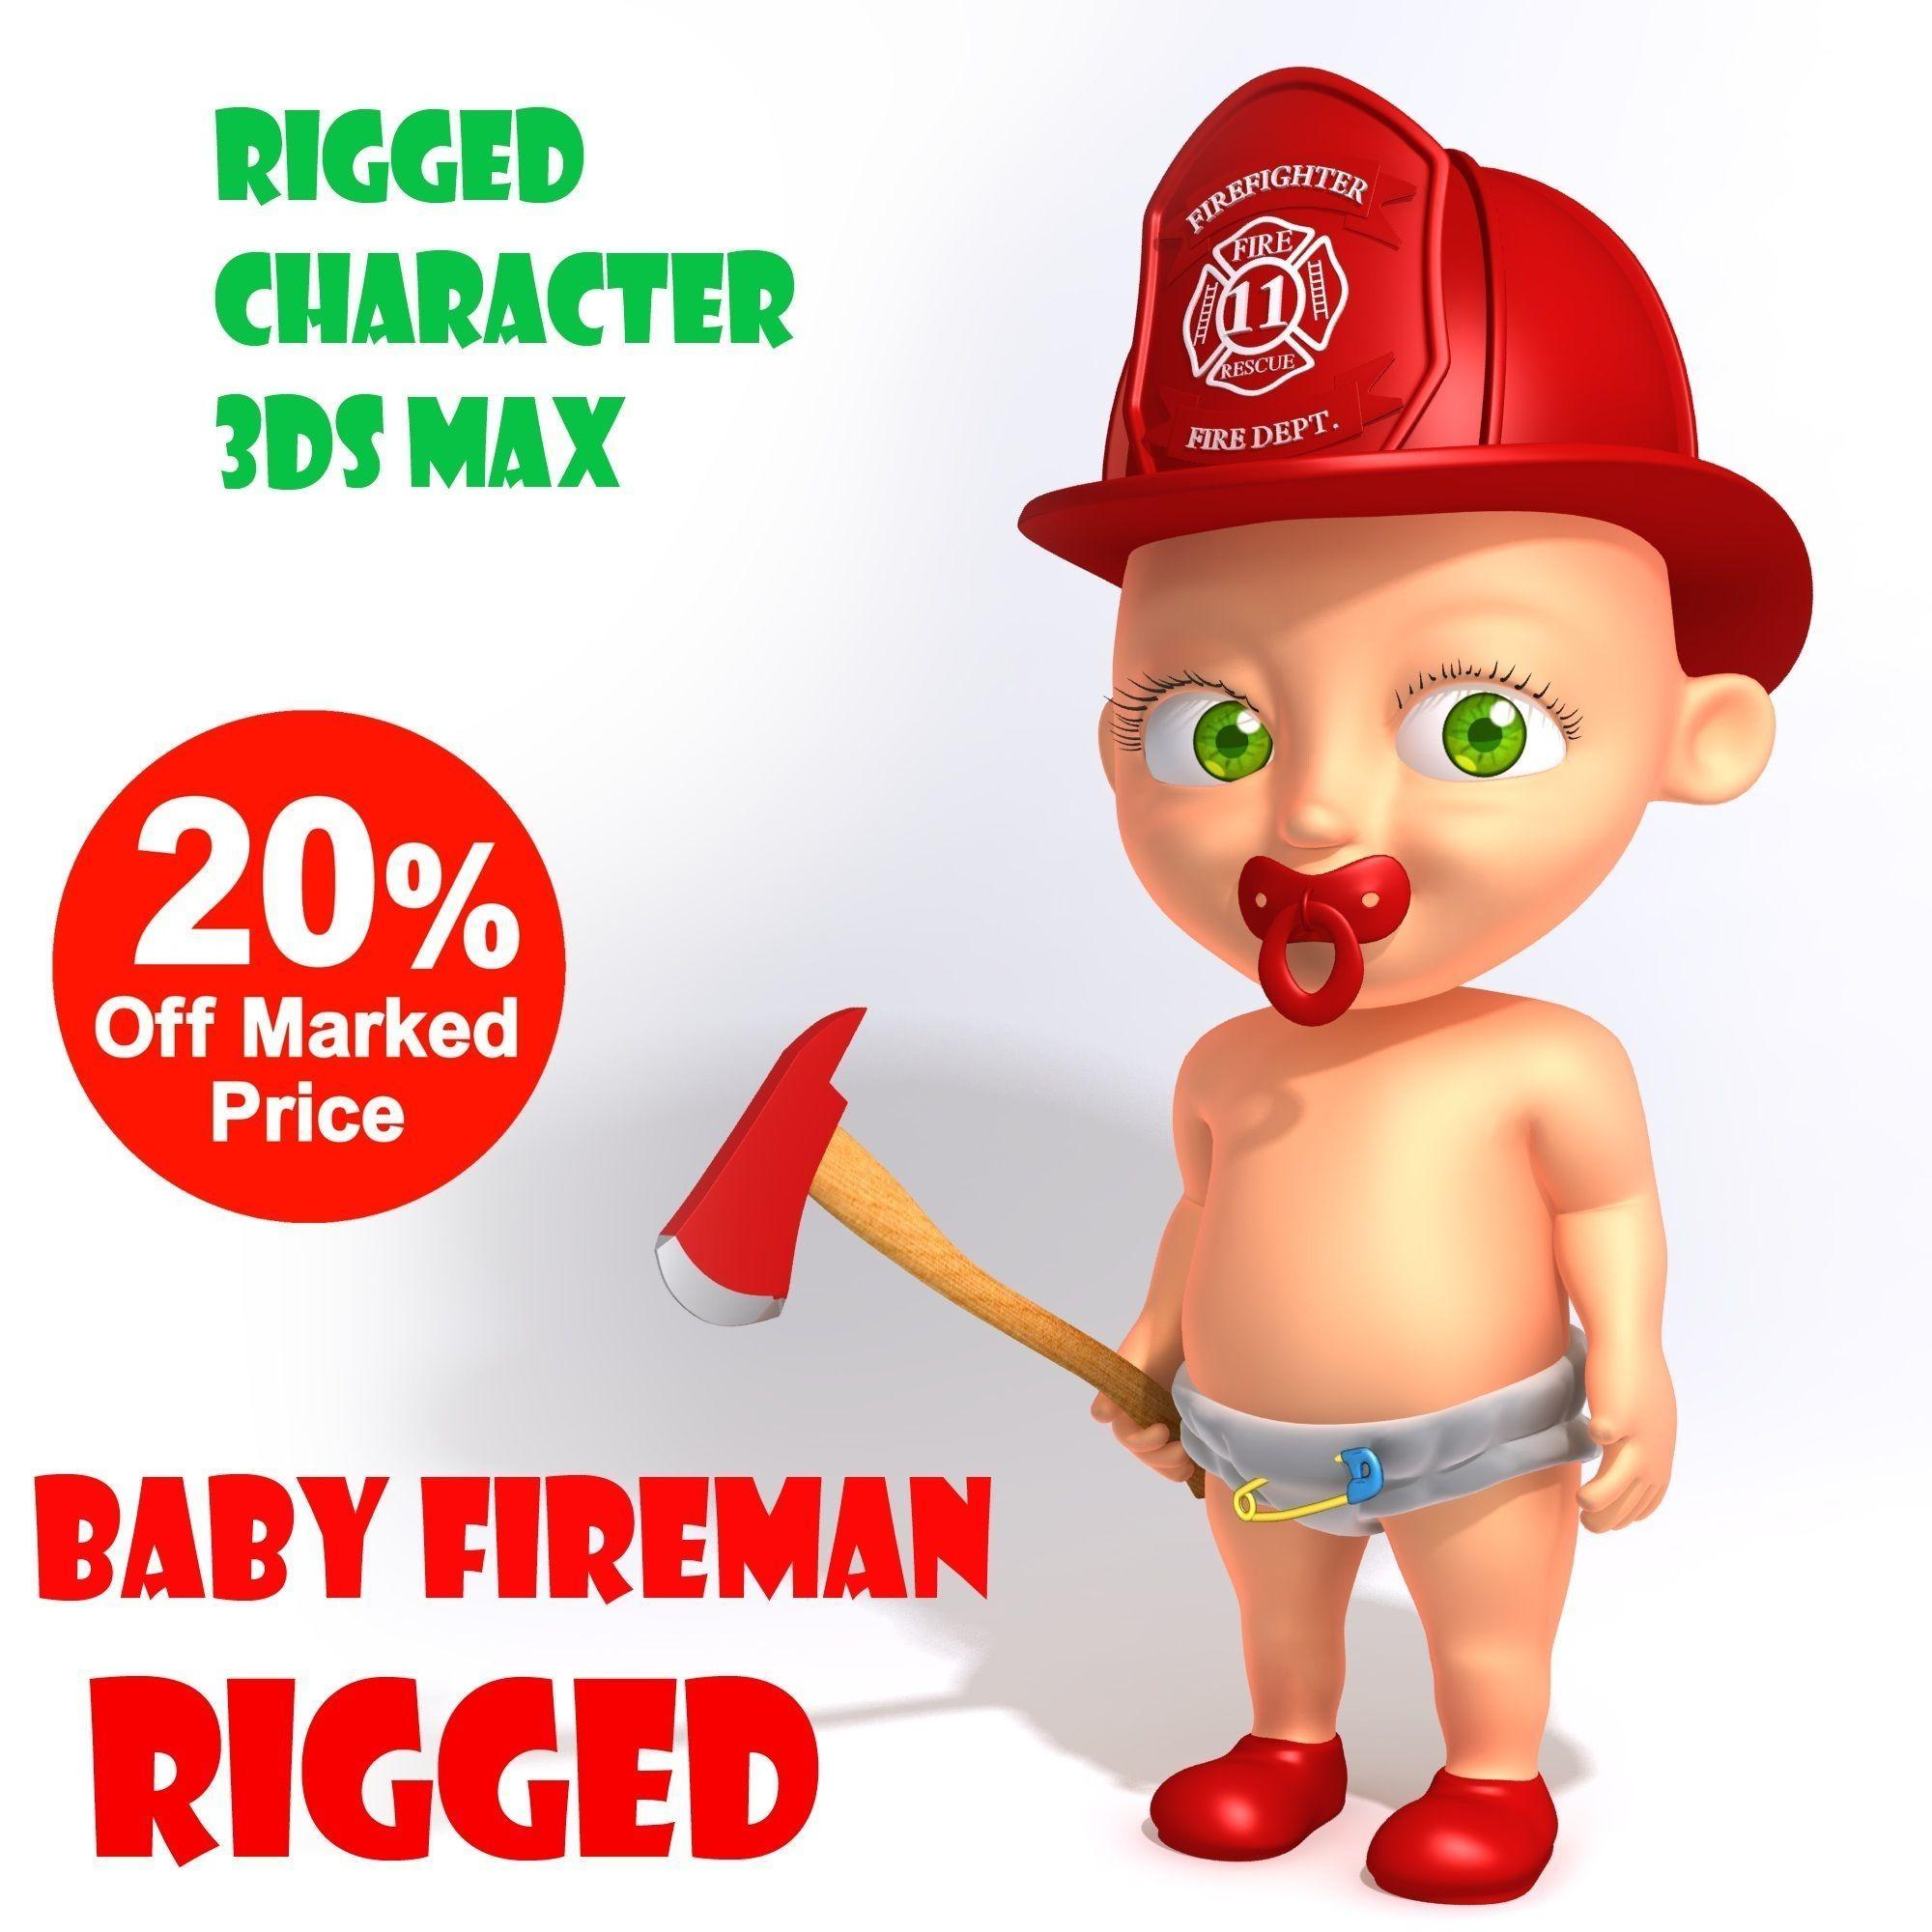 baby fireman cartoon rigged